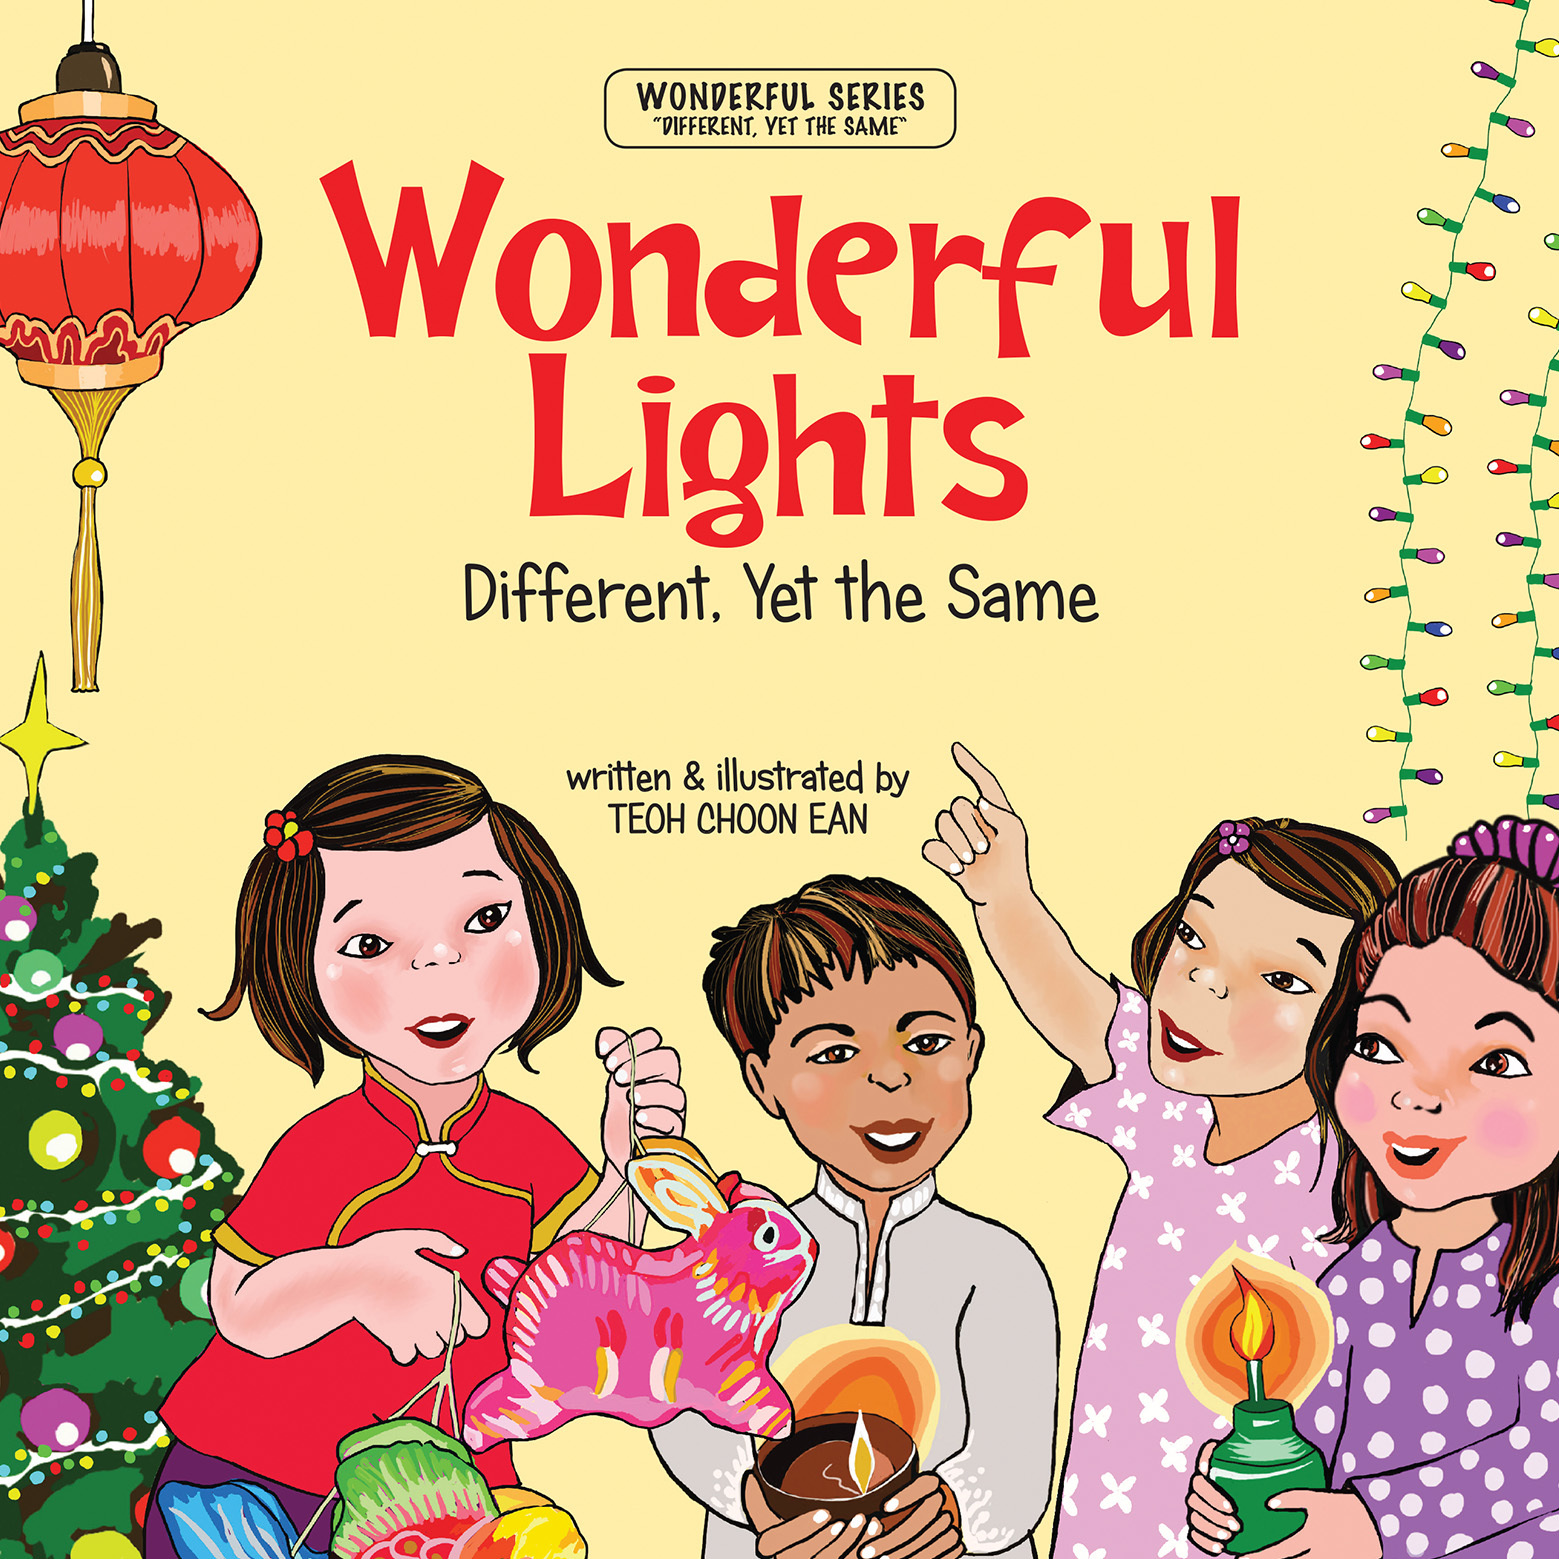 WS_Wonderful Lights.jpg